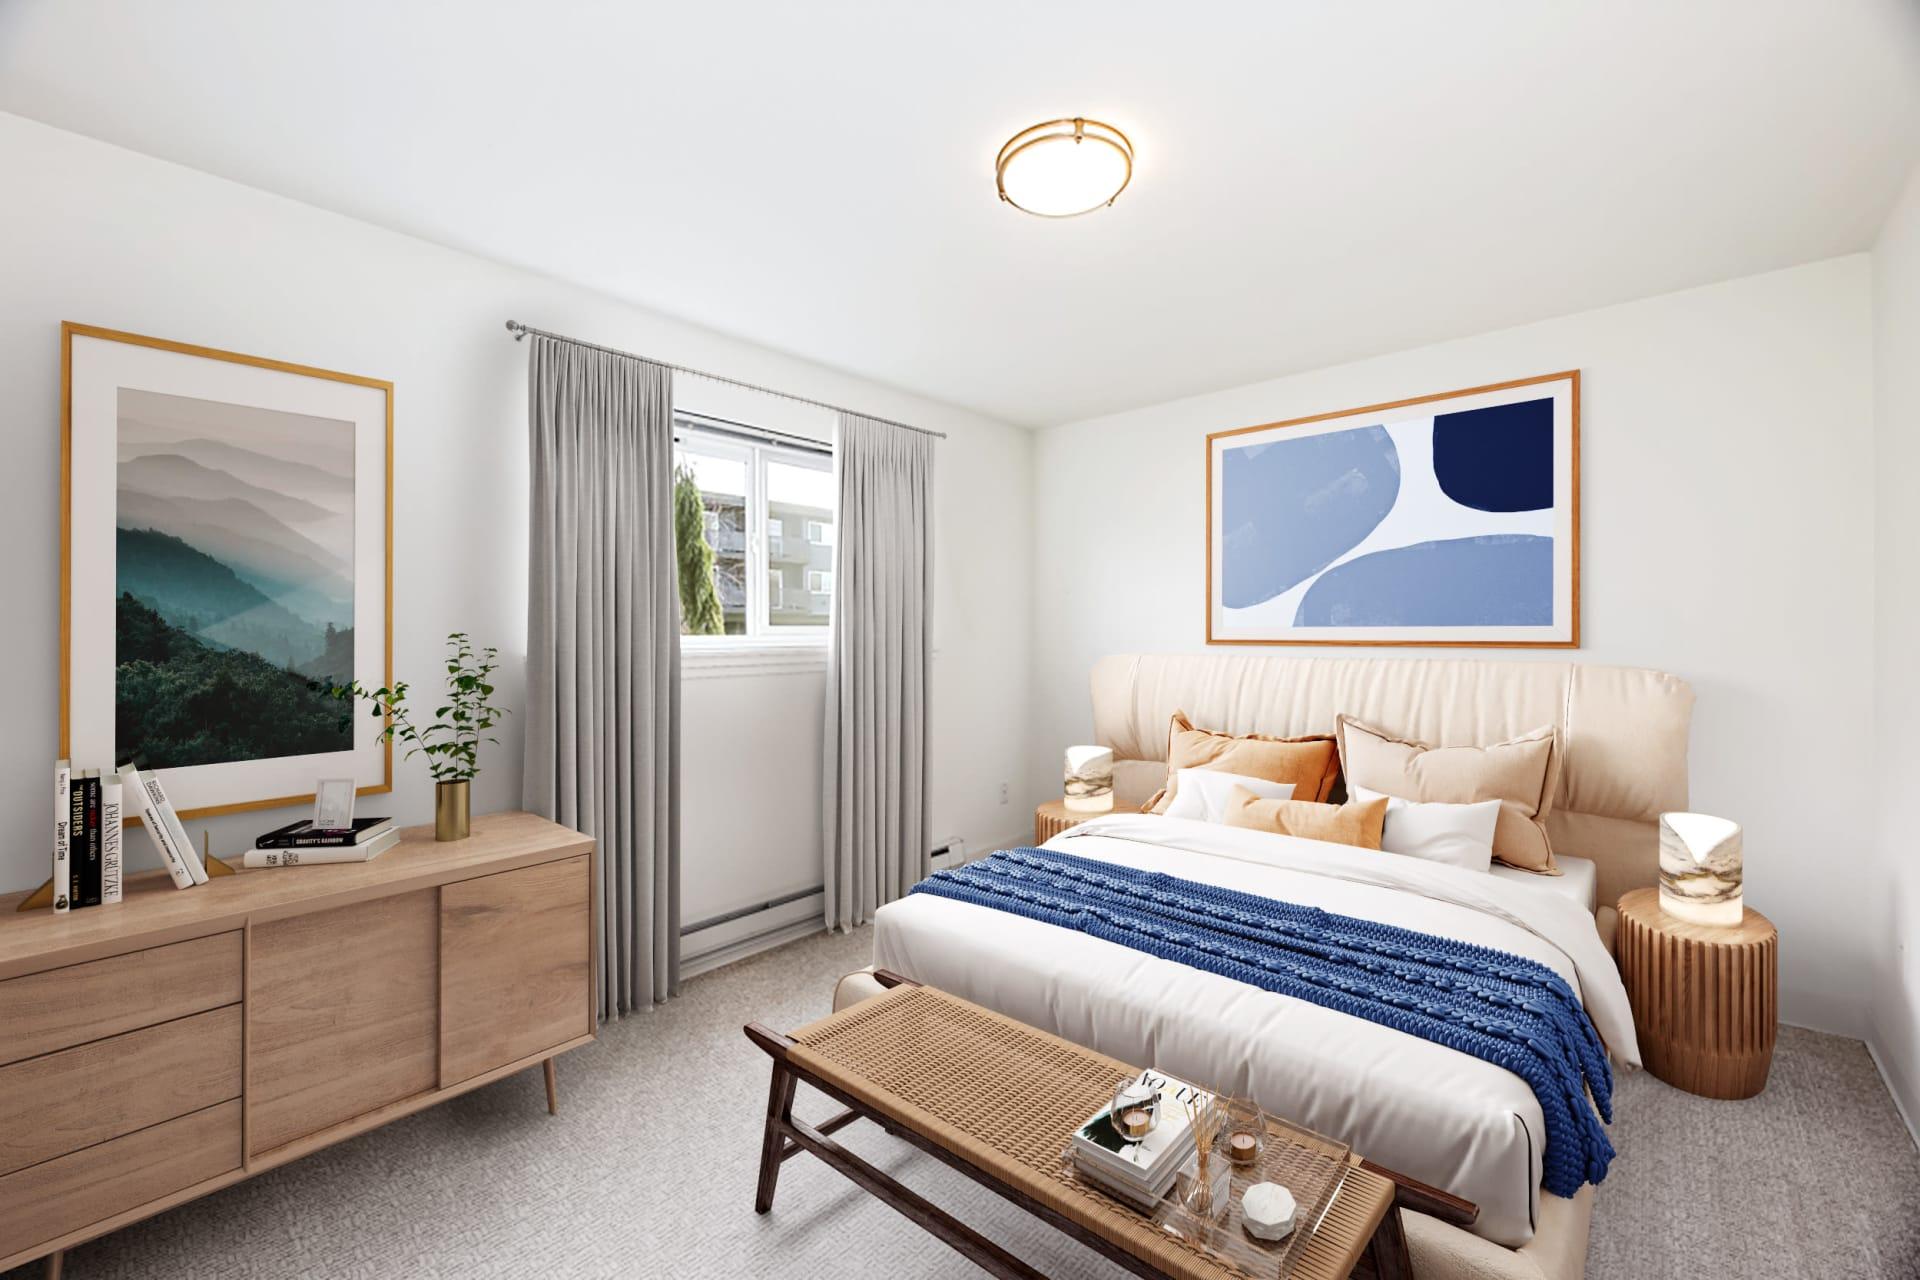 Sample Bedroom at Union 18 in Seattle, Washington